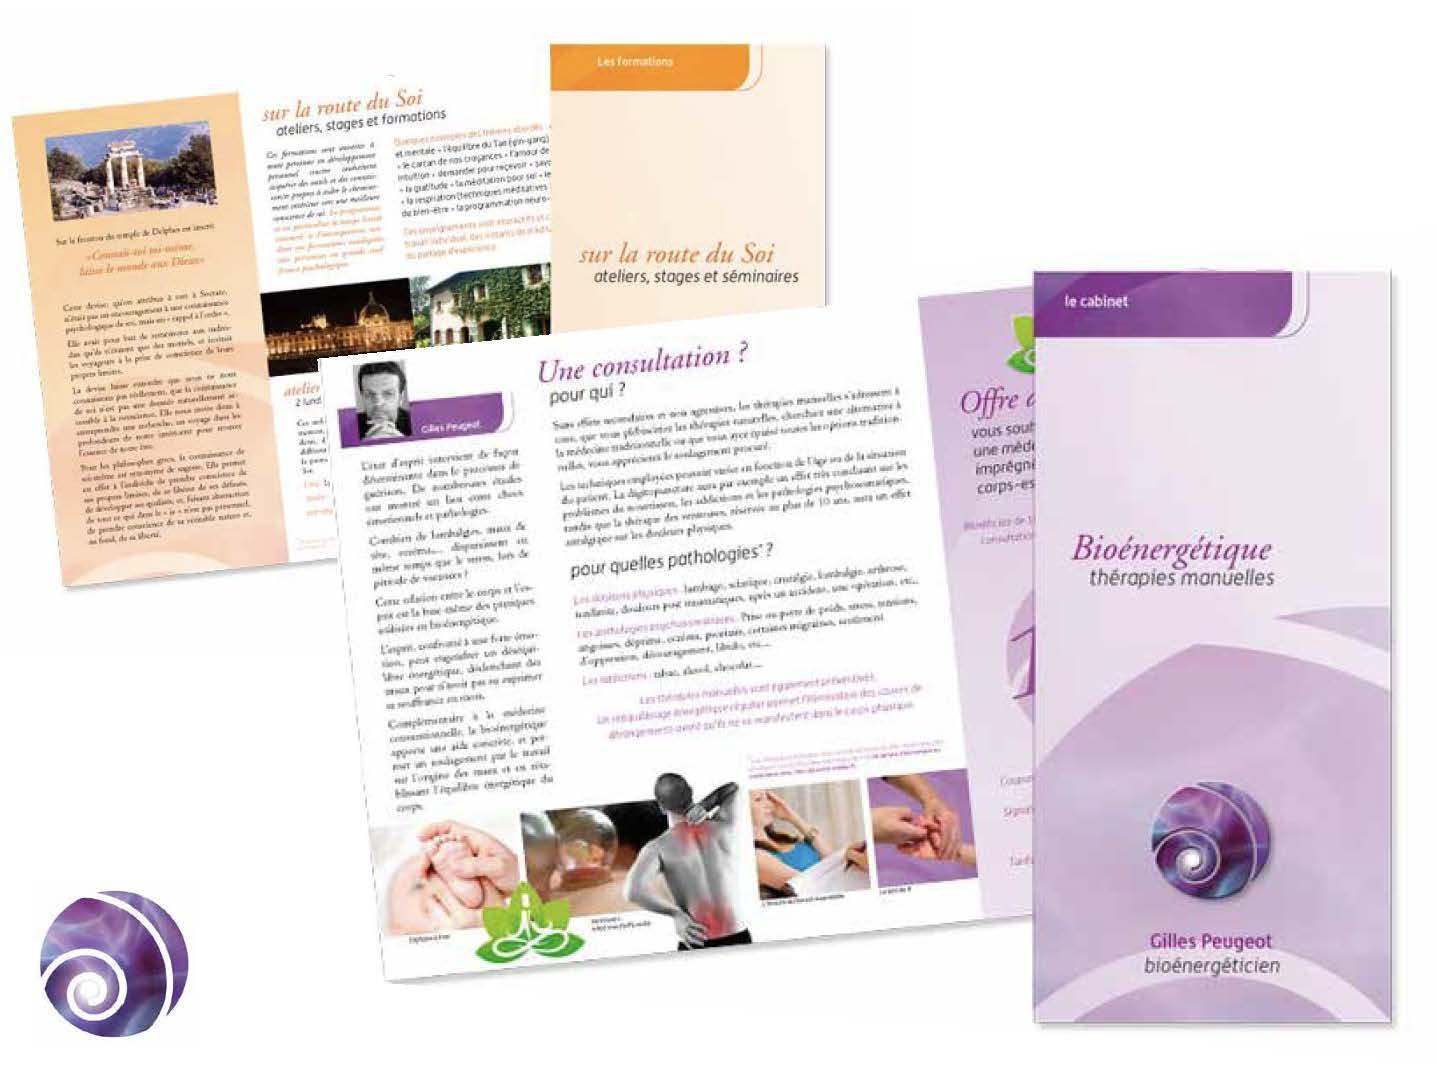 plaquettes_bioenergeticien